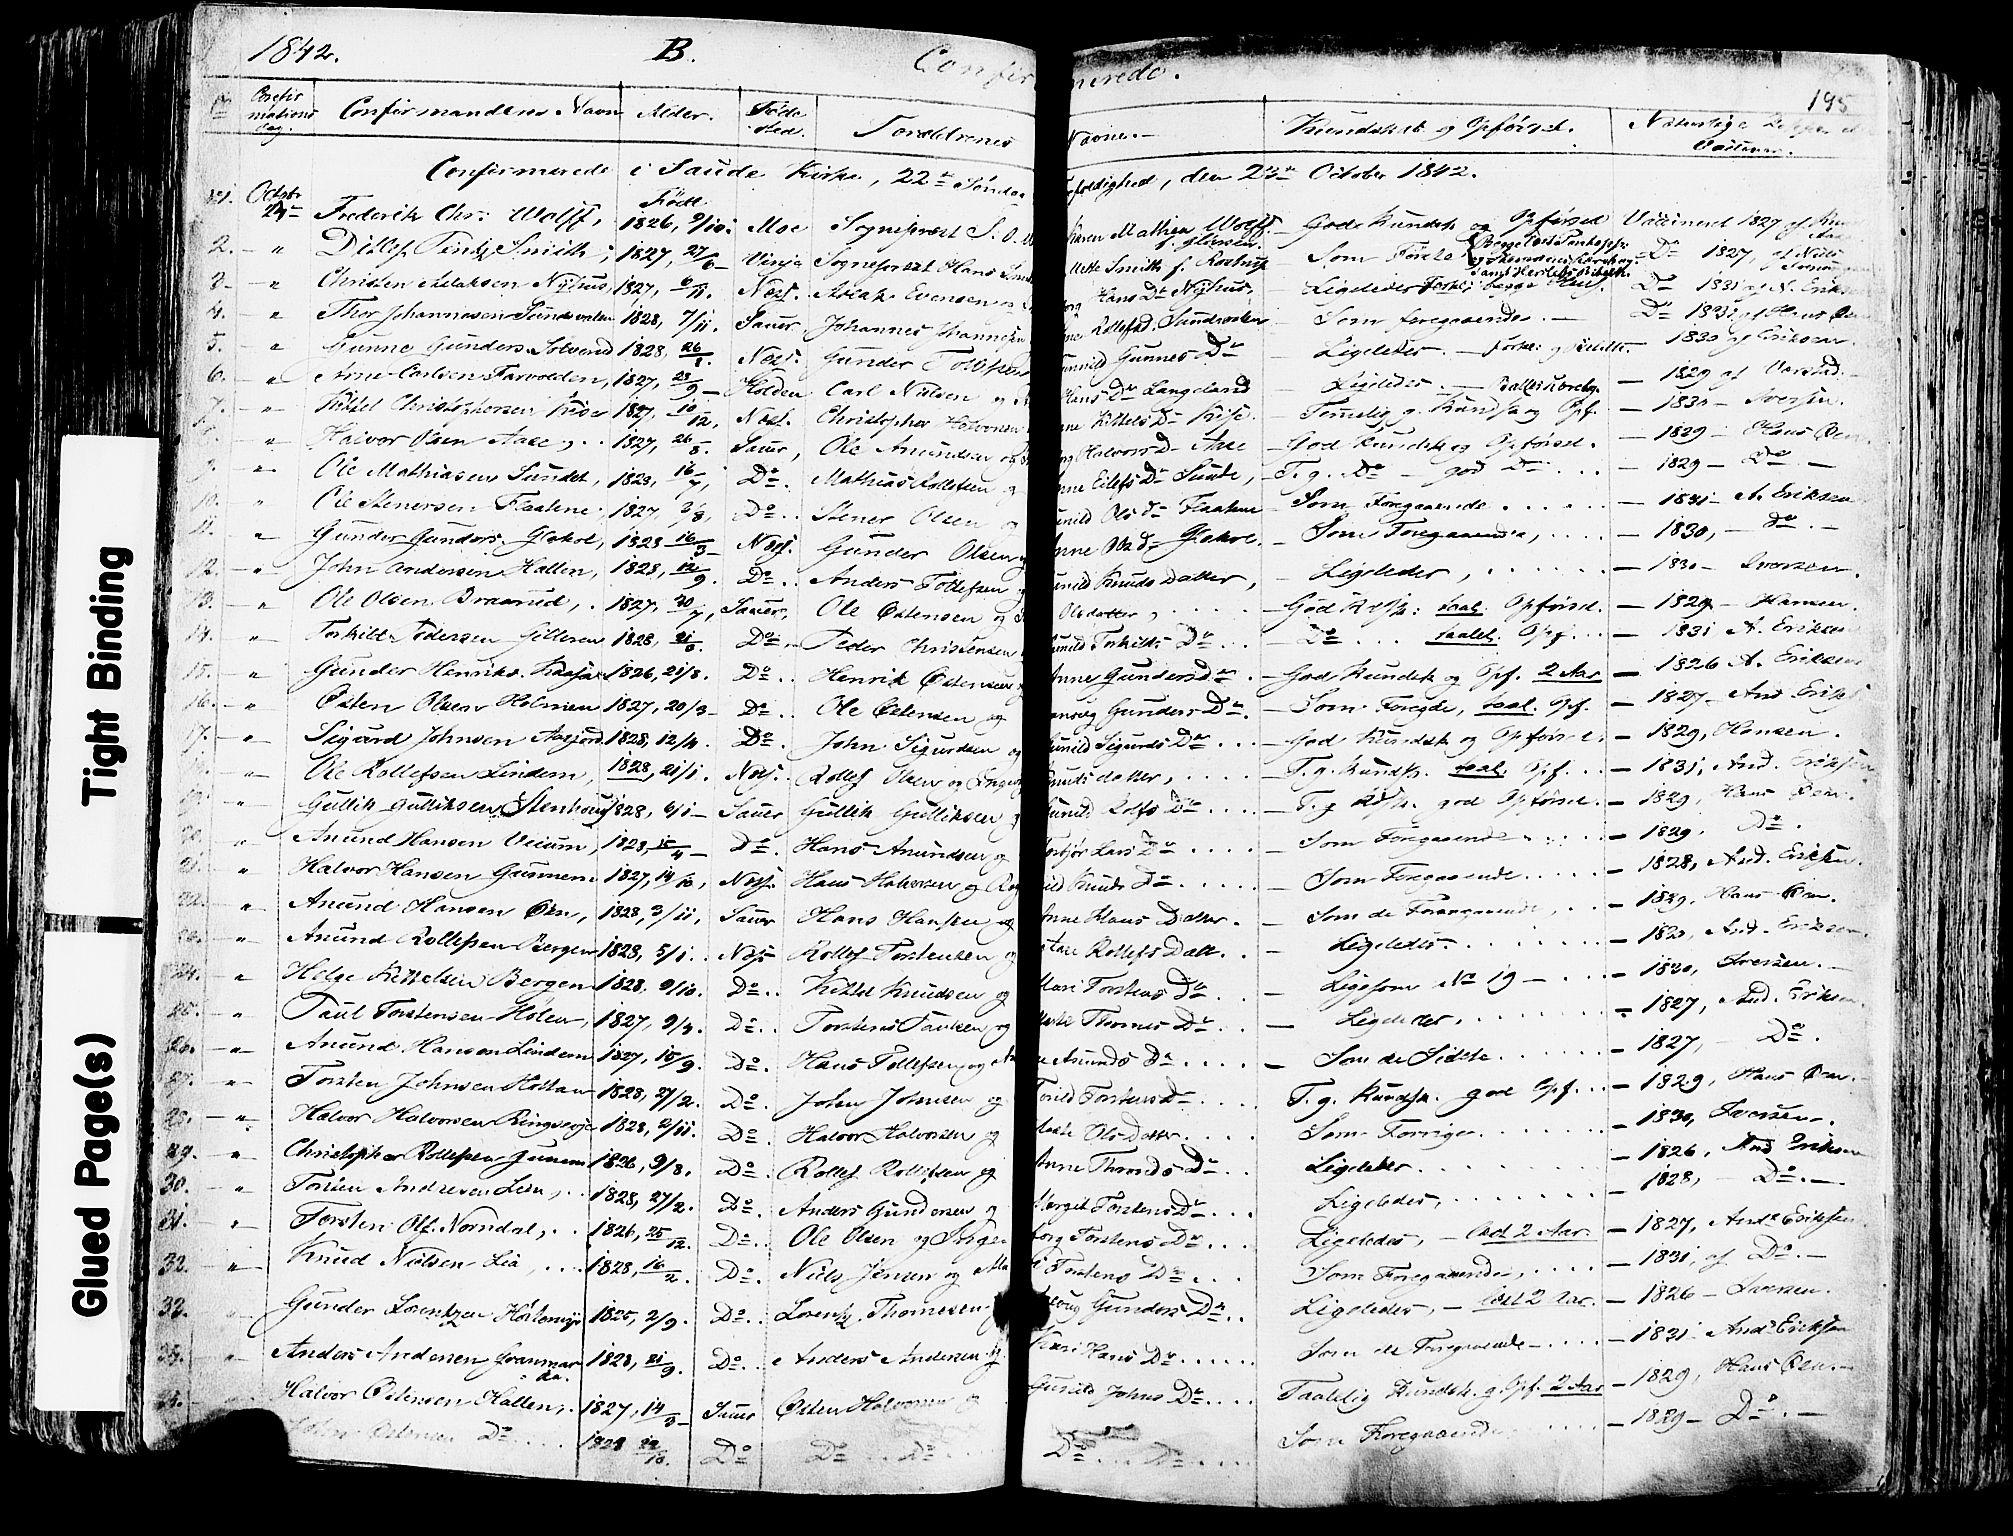 SAKO, Sauherad kirkebøker, F/Fa/L0006: Ministerialbok nr. I 6, 1827-1850, s. 195